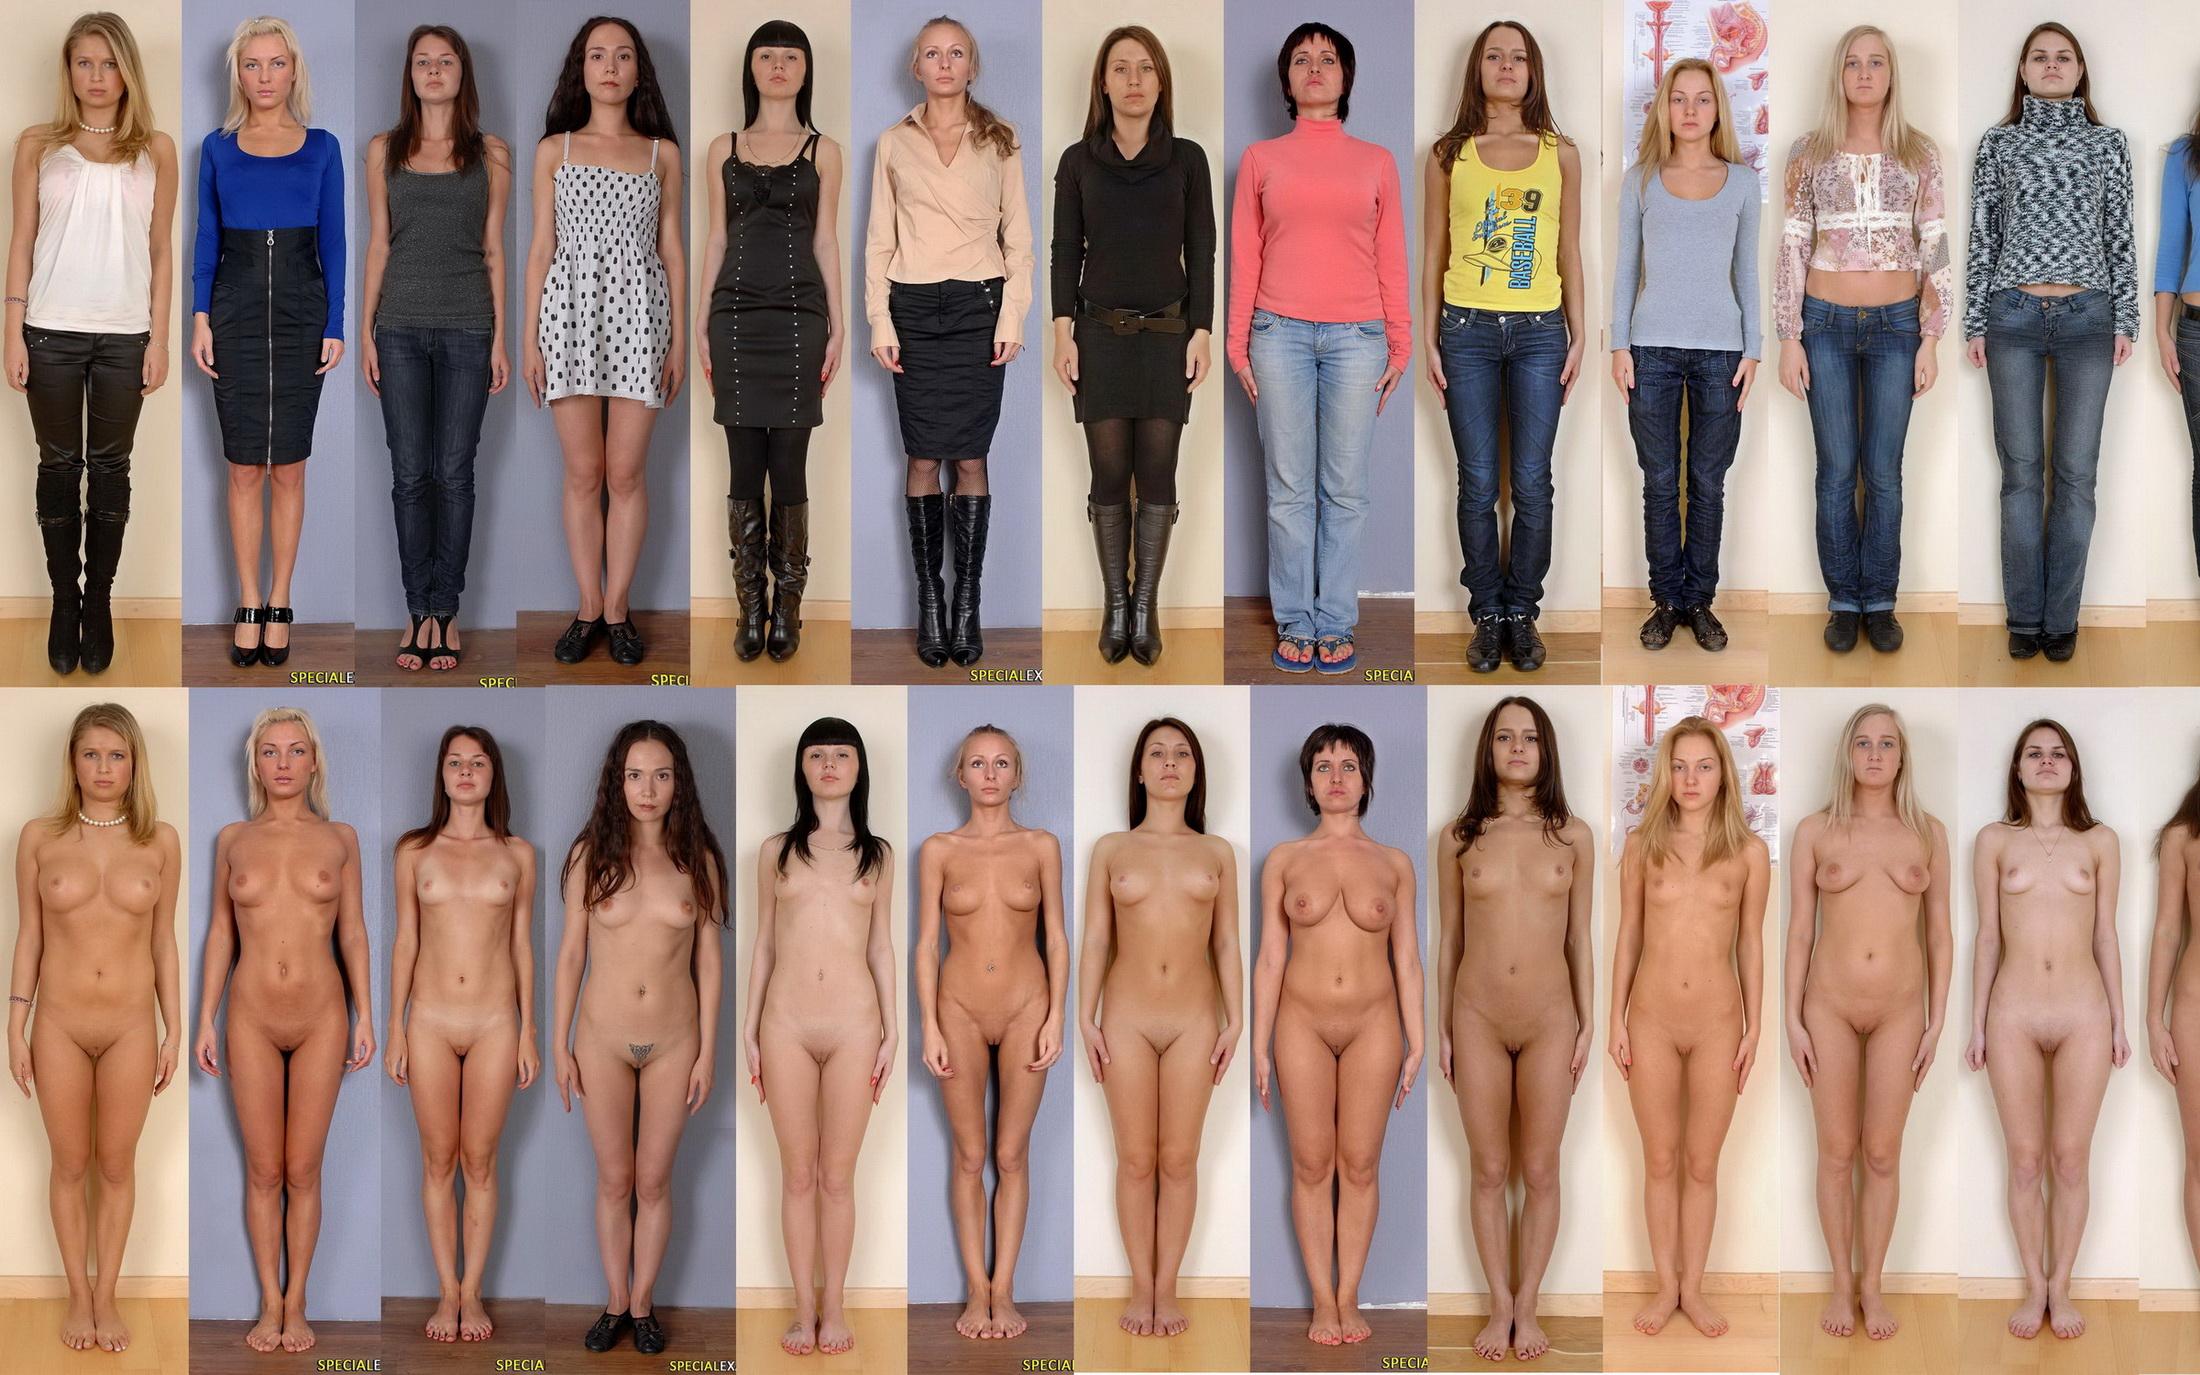 girls-comparison-nude